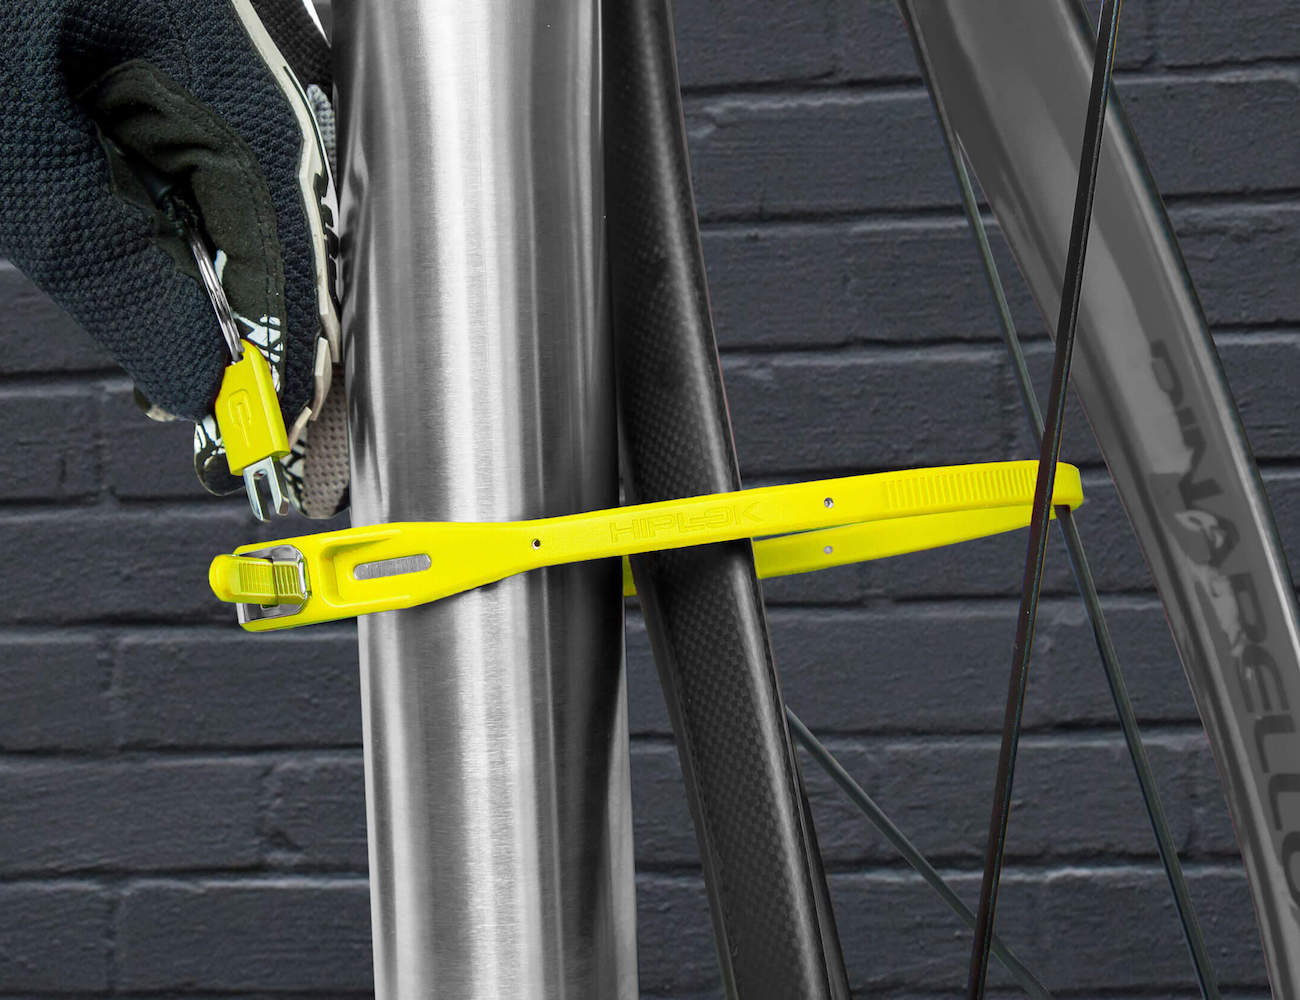 Z+Lok+Secure+Zip+Tie